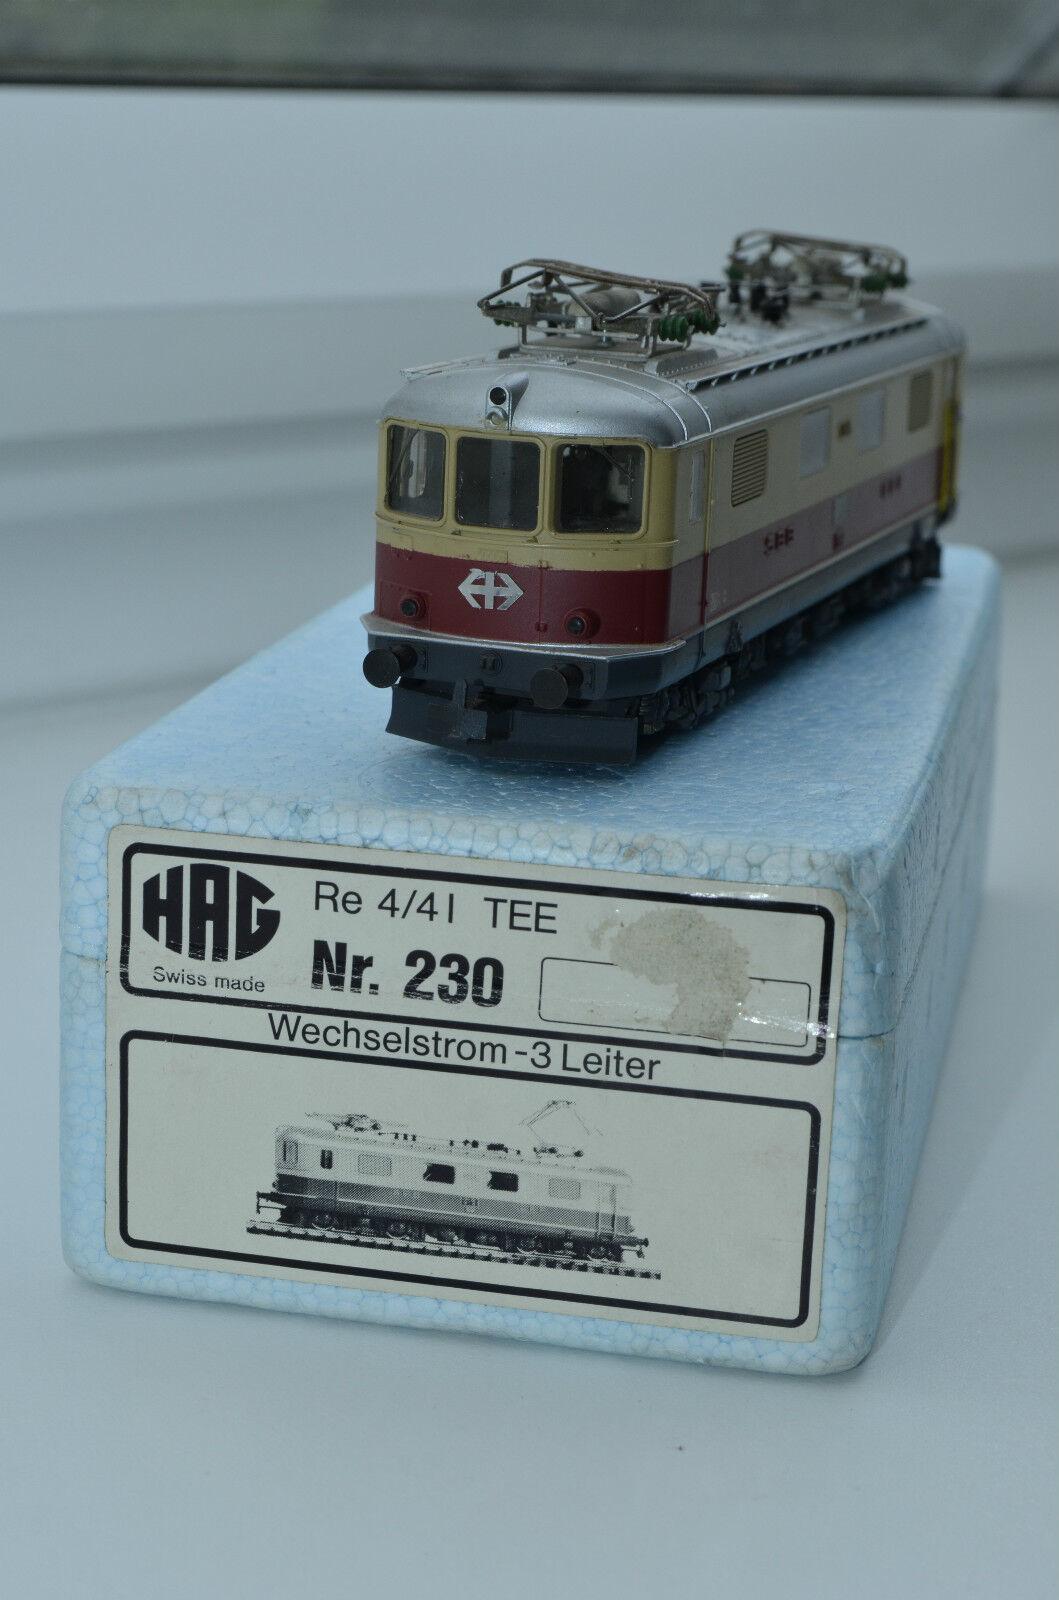 Hag 230 tren bala LOK Elektro Lok br.re4 4 35  embalaje original